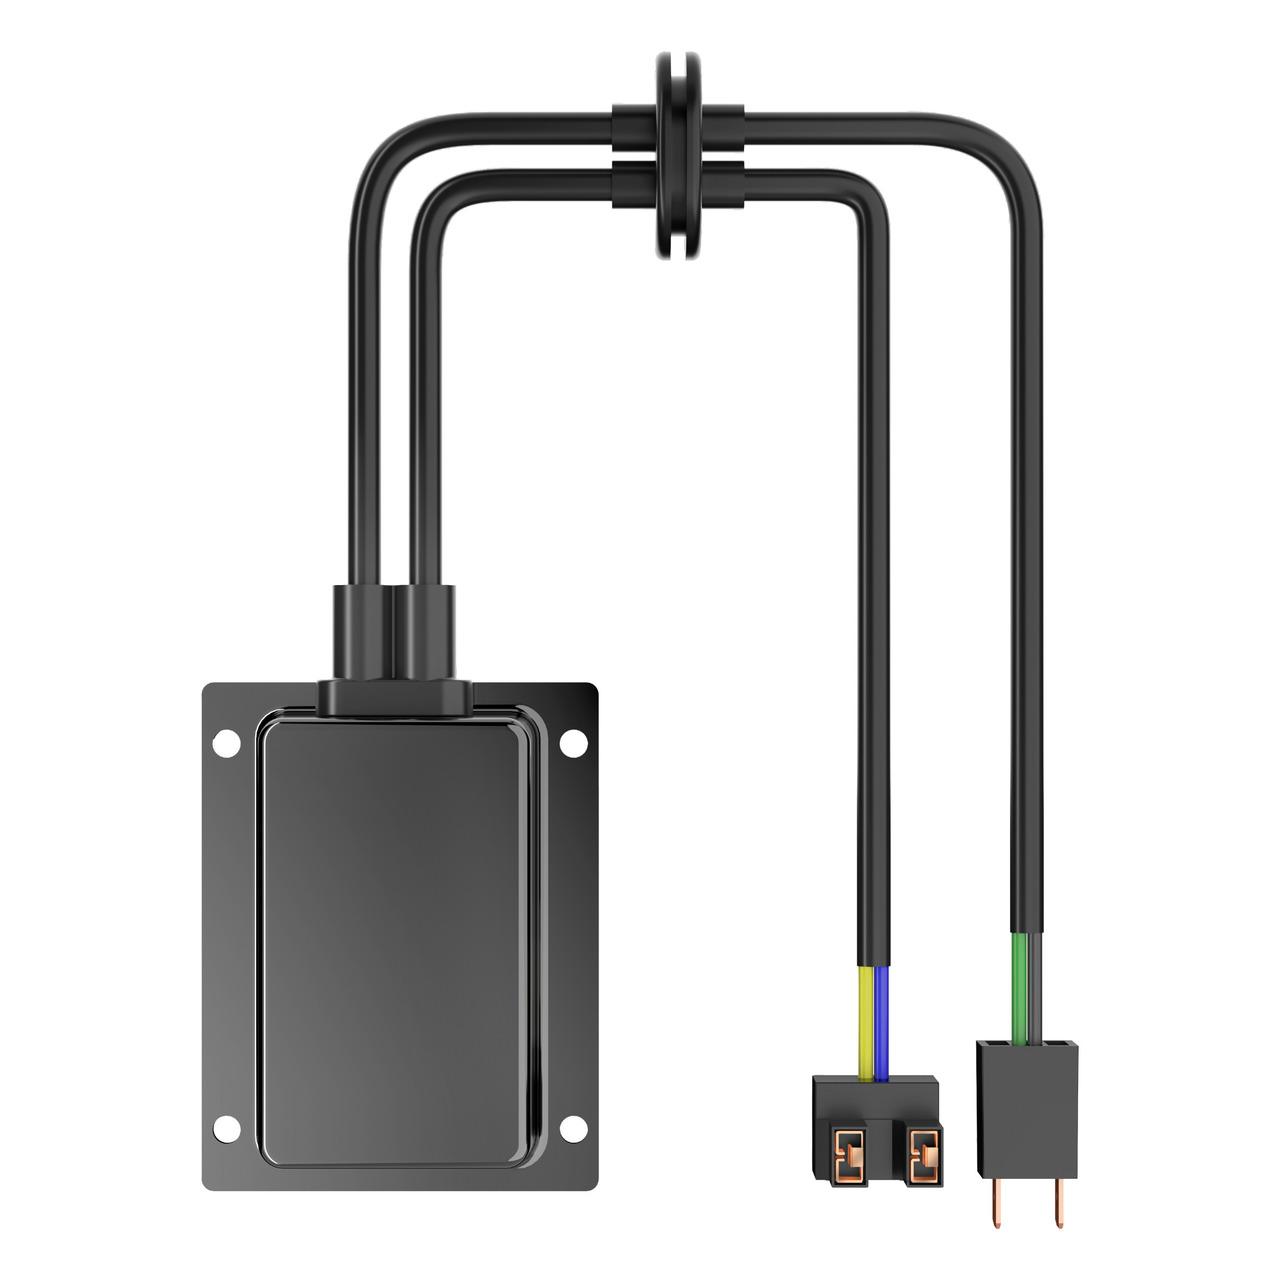 OSRAM LEDriving Smart CAN-Bus LEDSC01 für NIGHT BREAKER(R) LED- für kompatible Opel-Kfz